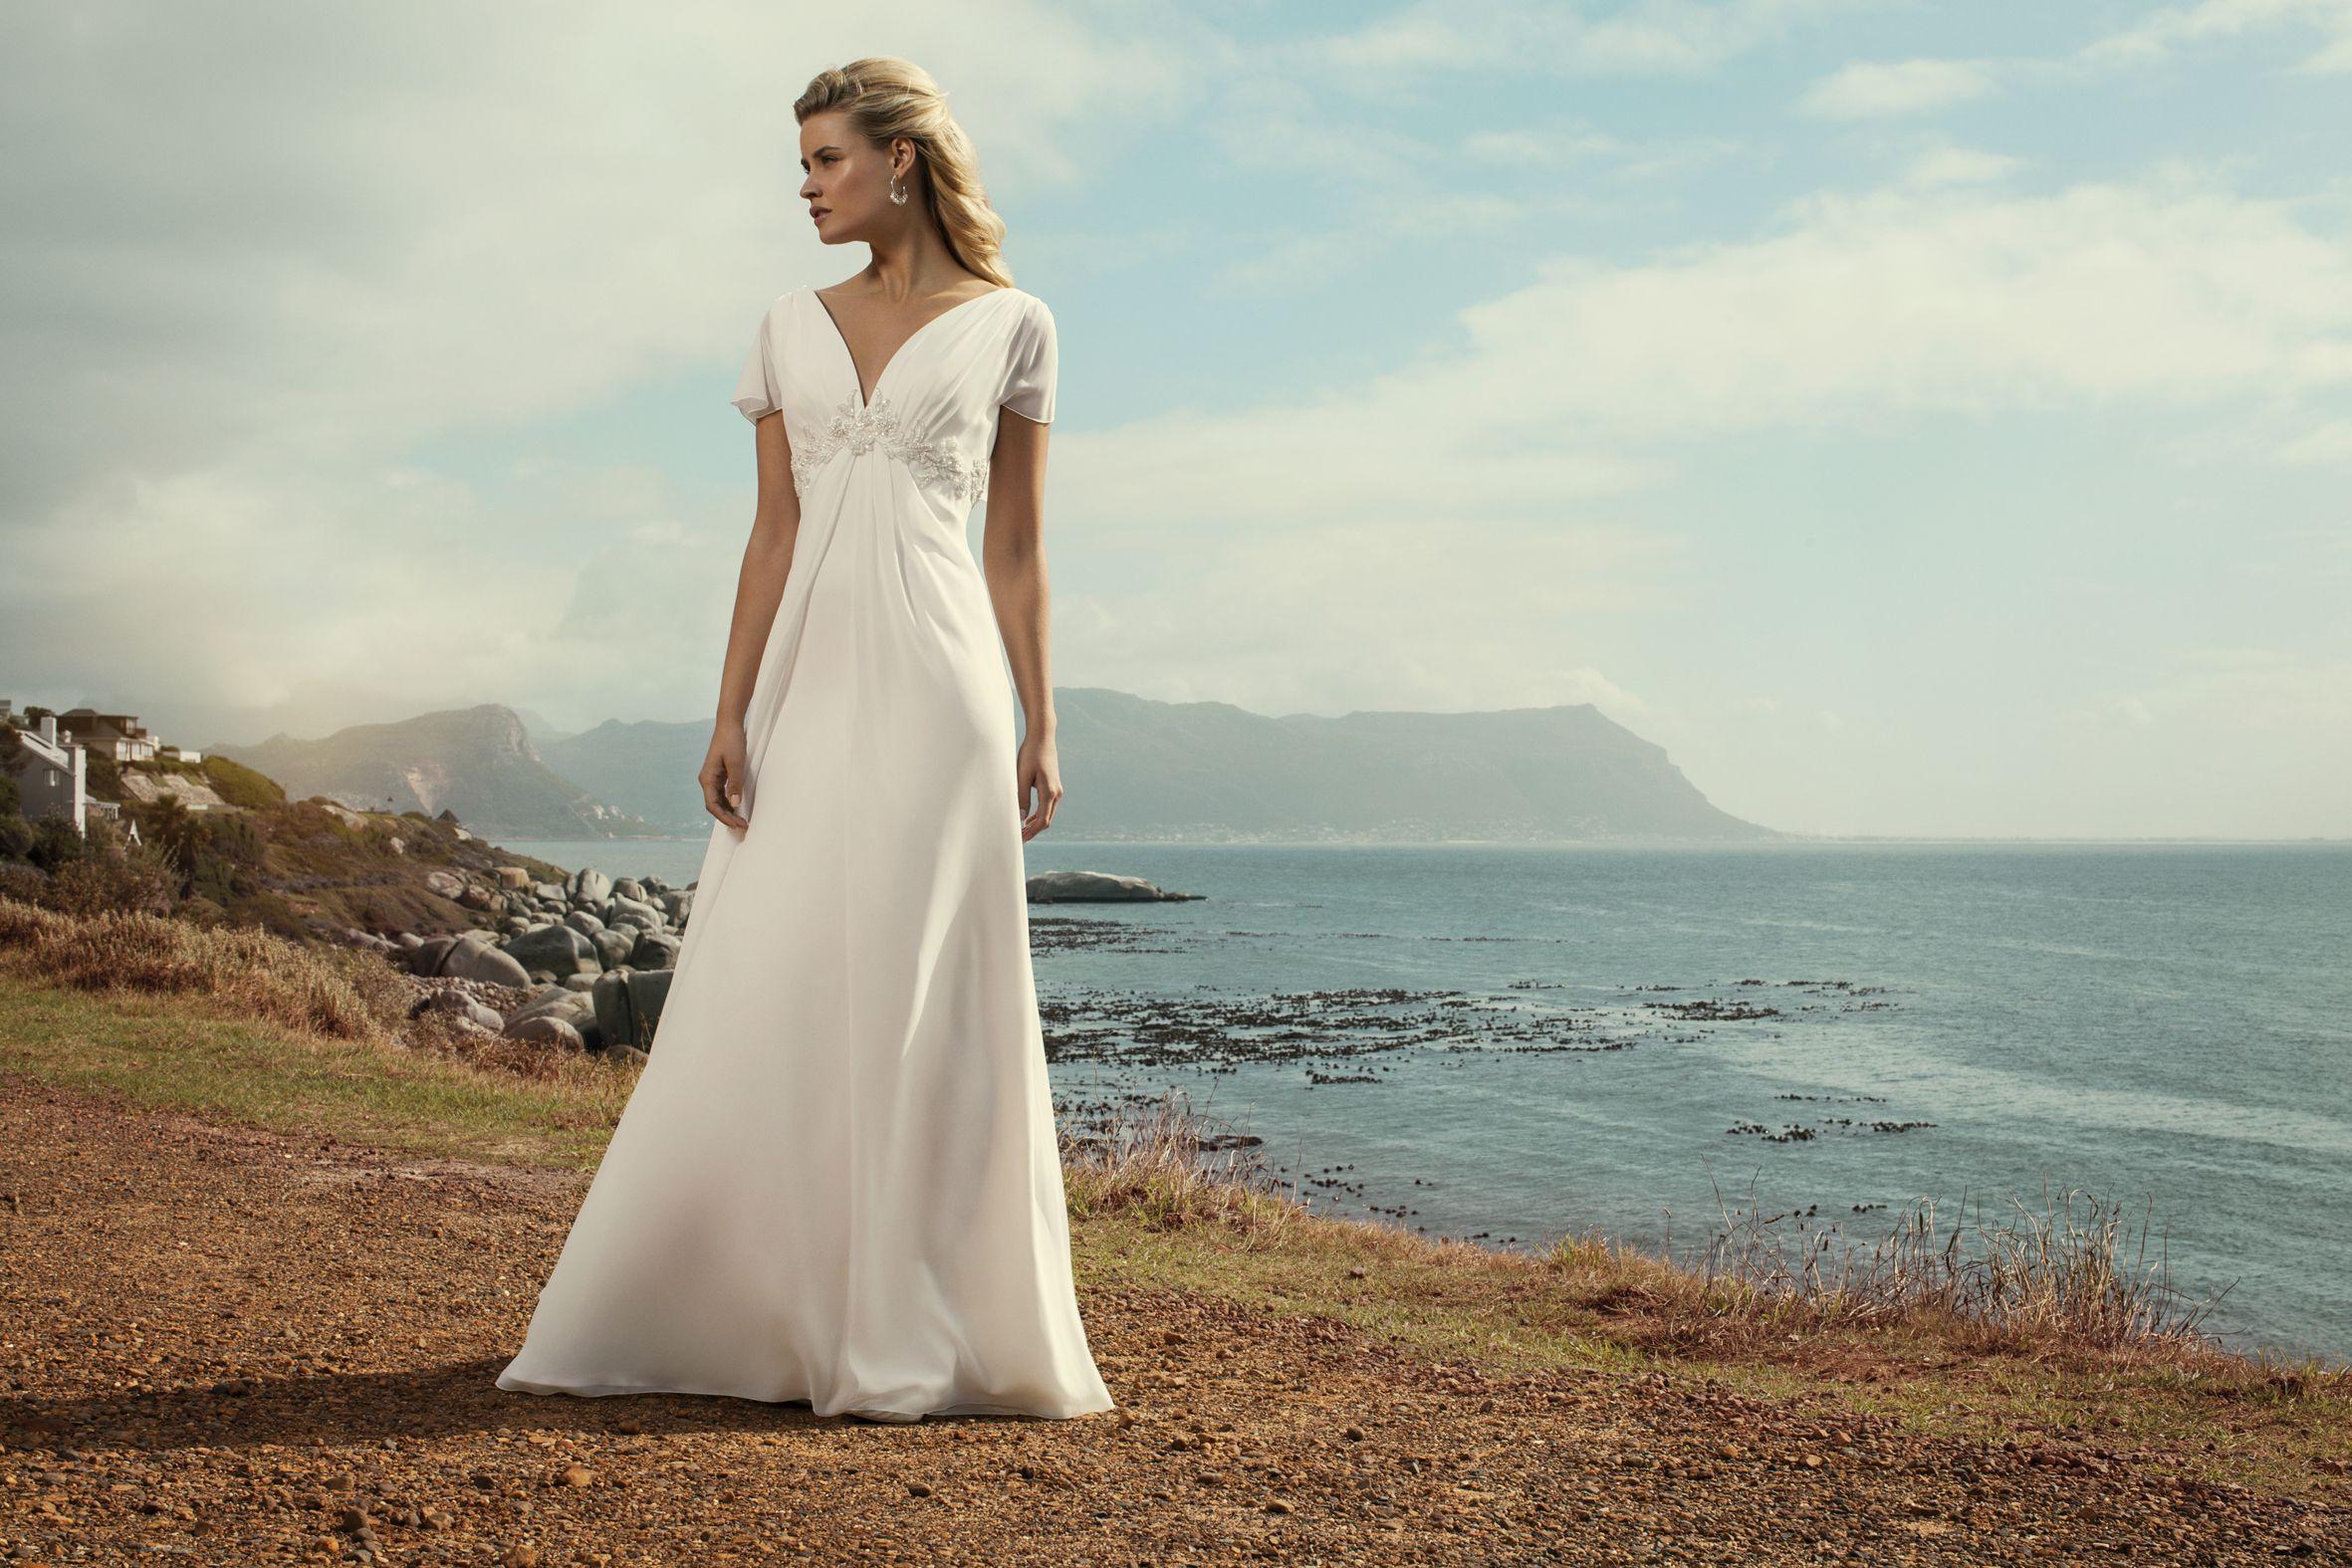 Marylise bridal gowns and wedding dresses - Phoenix | Photographic ...